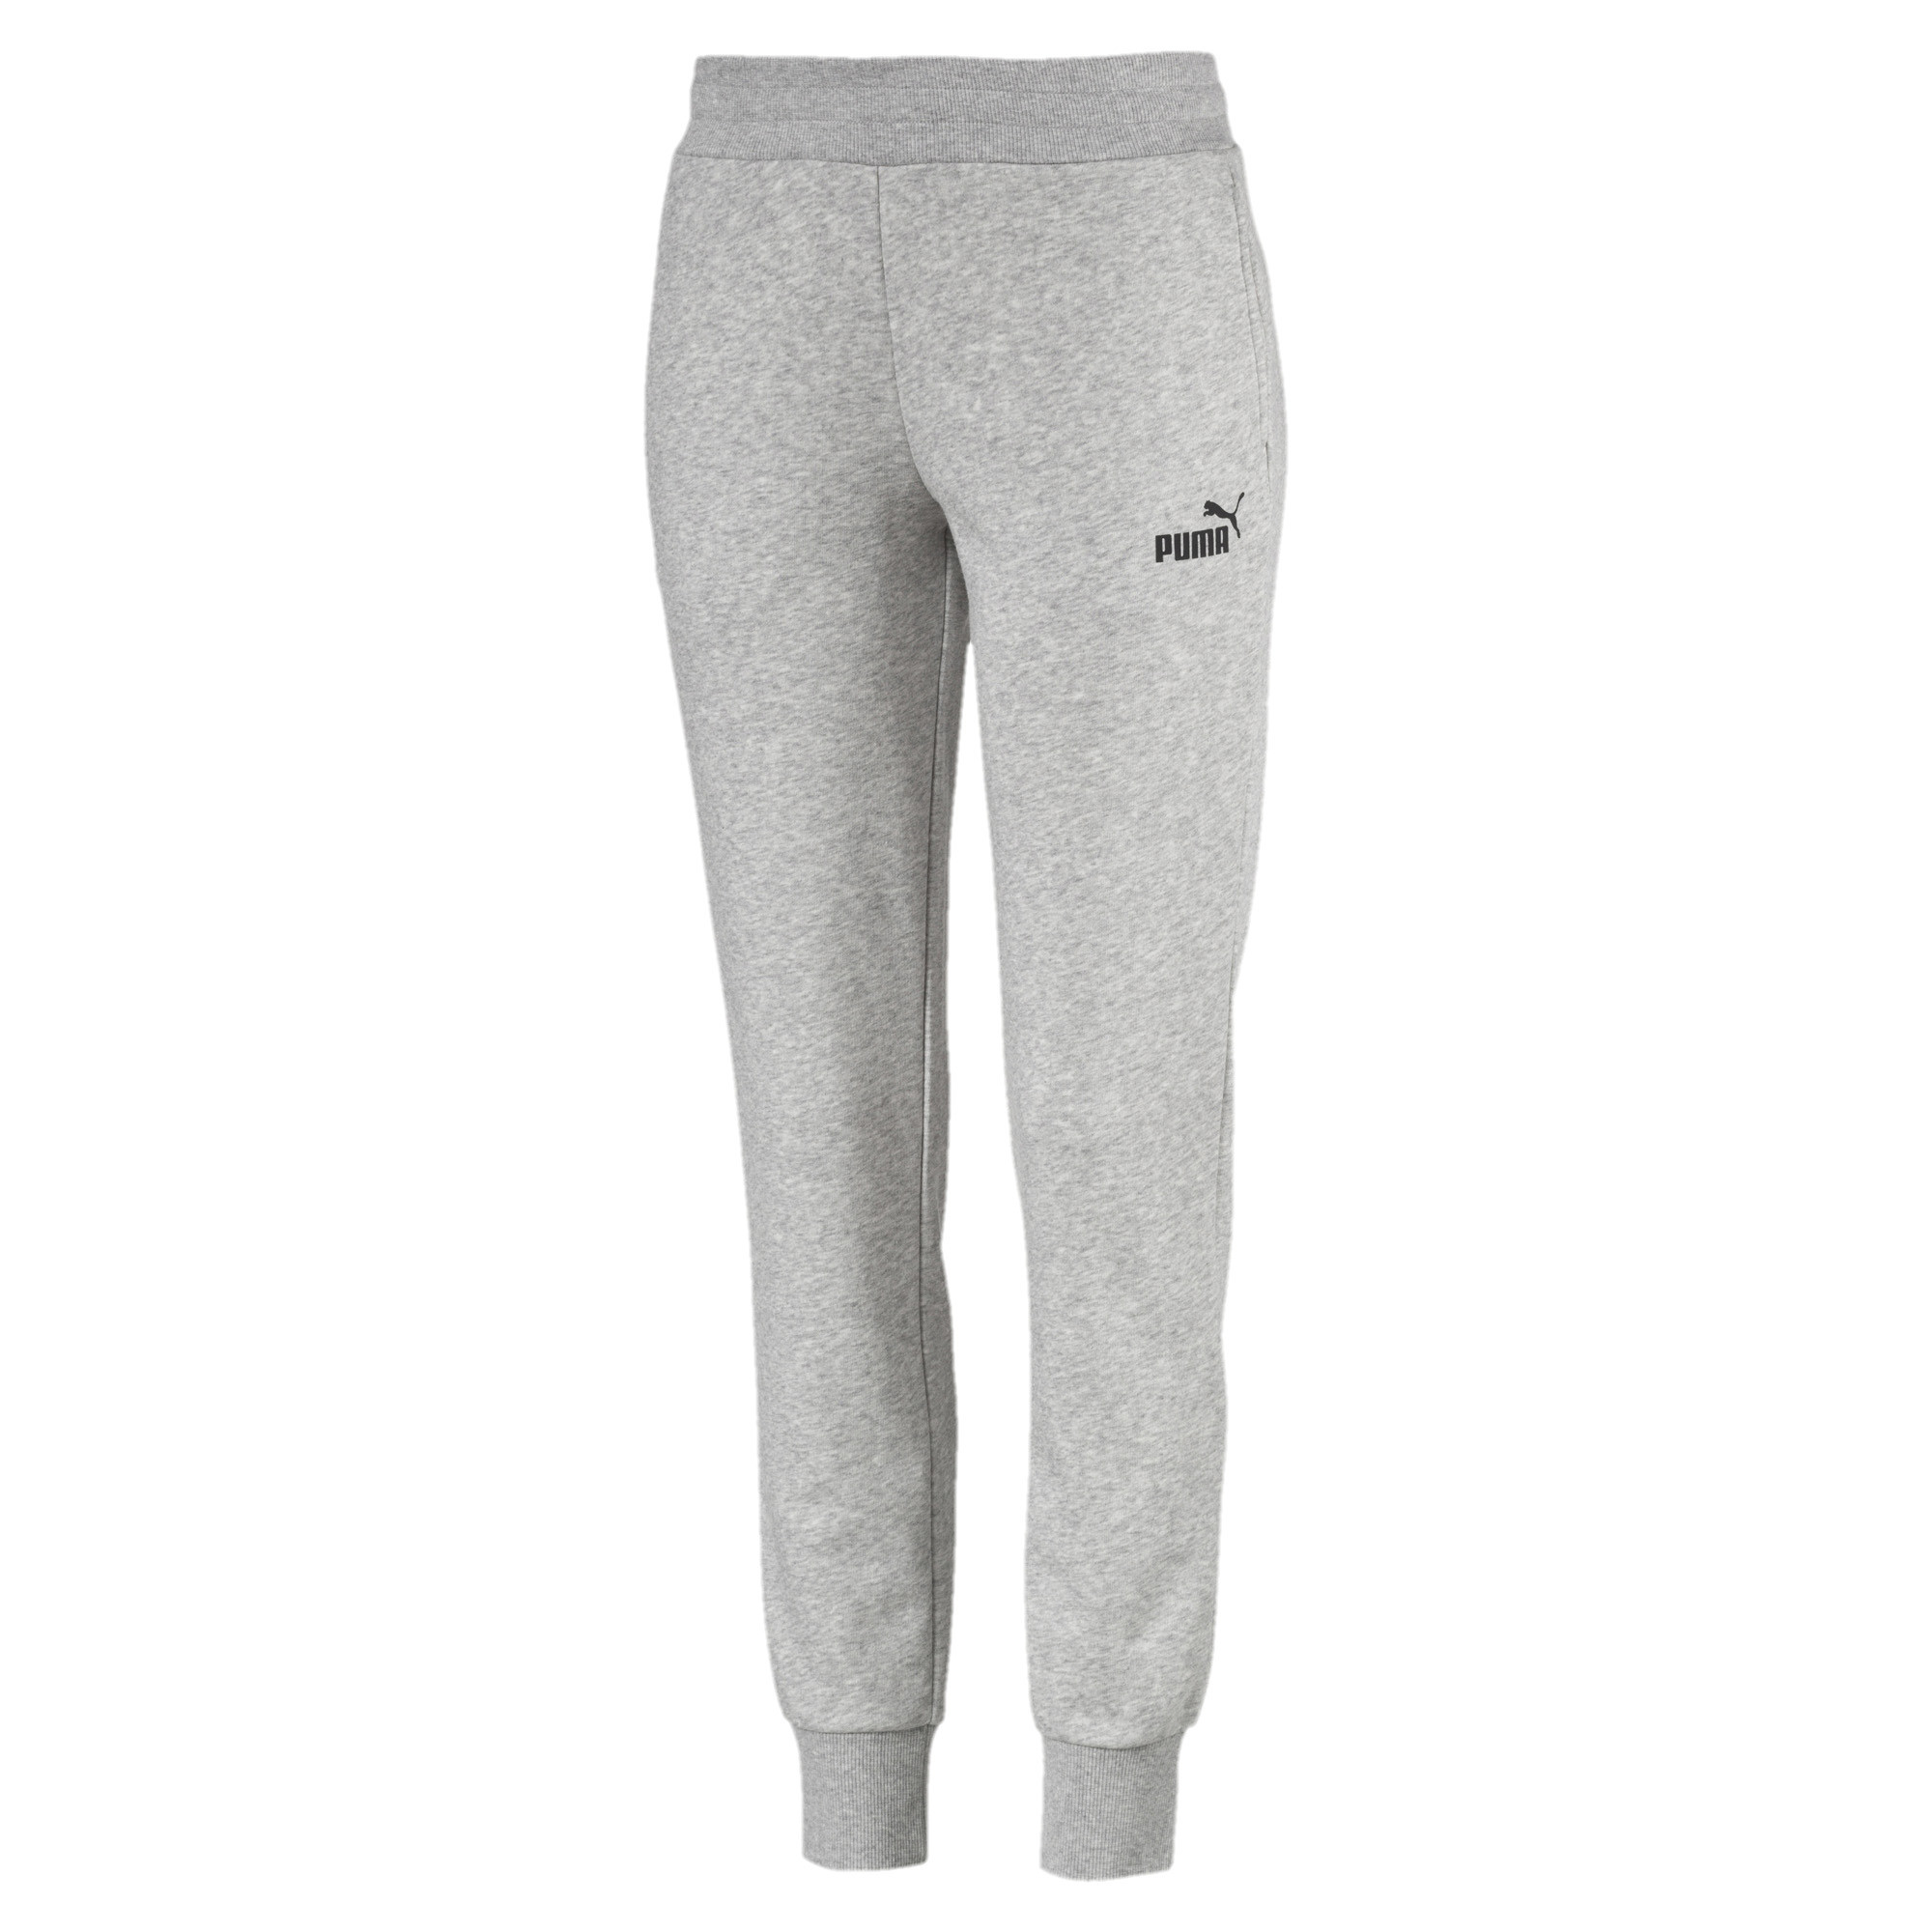 PUMA Essential Damen Gestrickte Sweatpants Frauen Hose